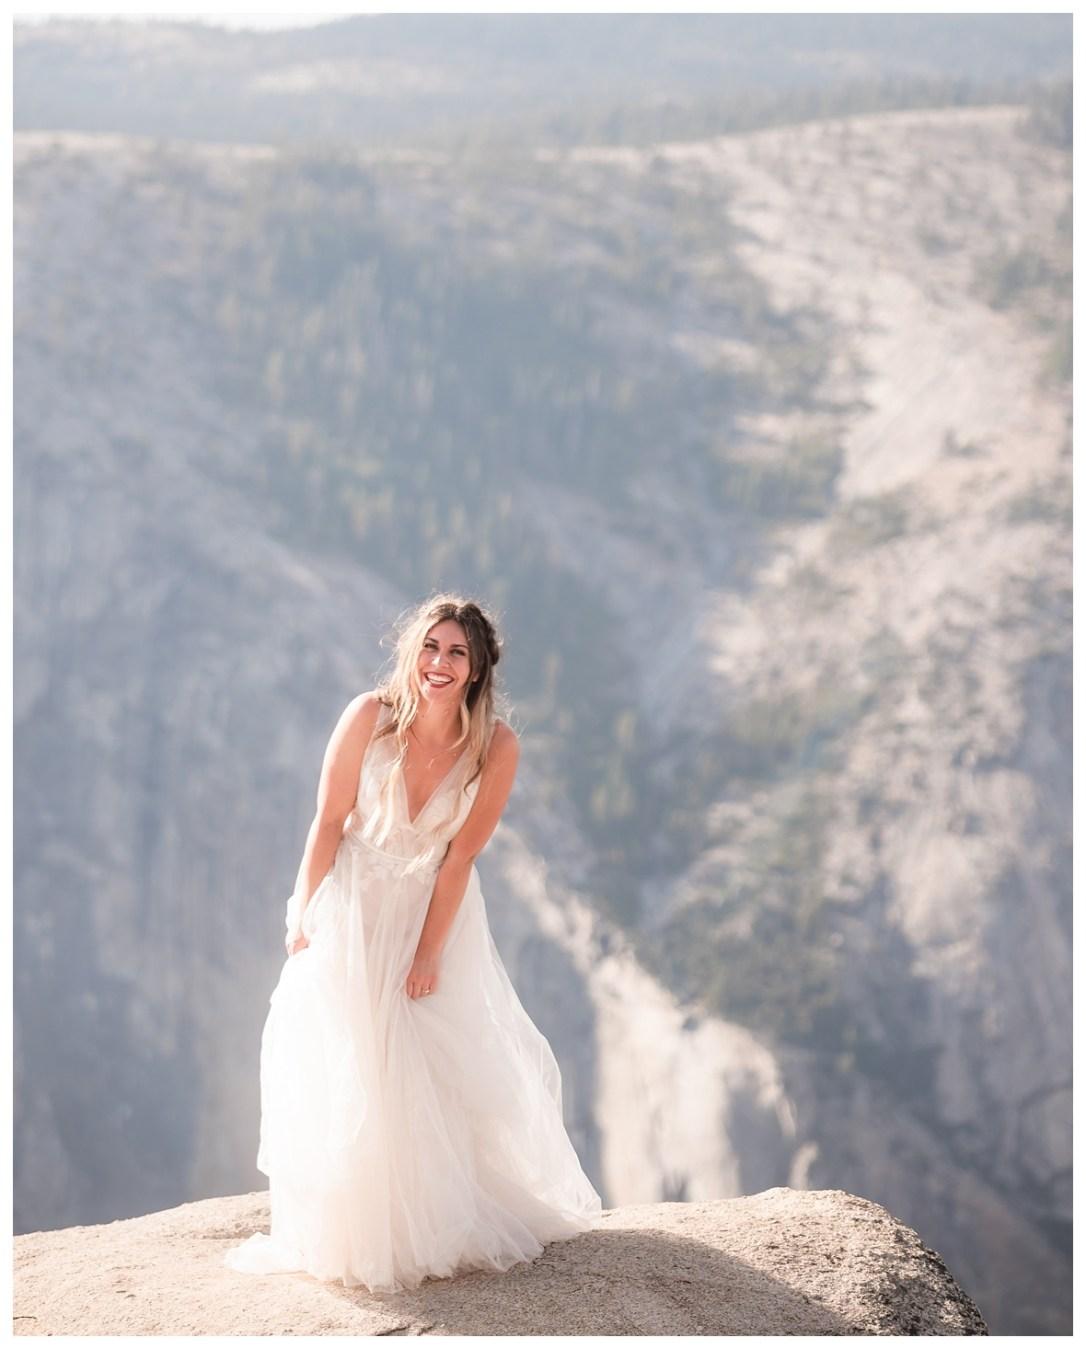 Taft Point Bridal Portraits bride laughing